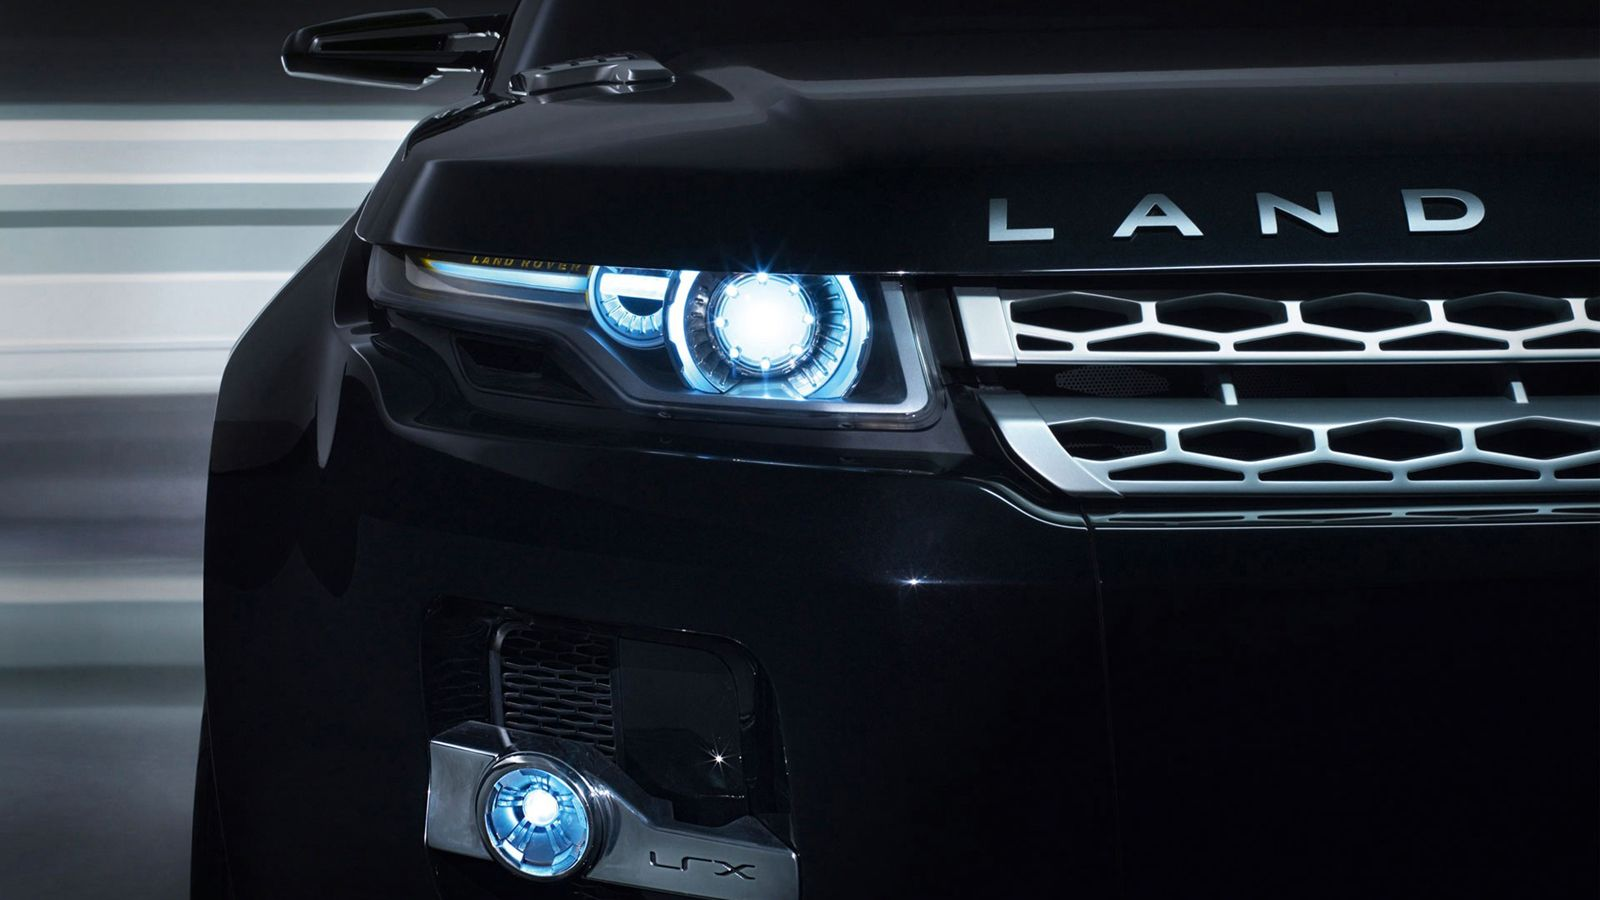 Land Rover Pride Range Rover Black Black Car Wallpaper Range Rover